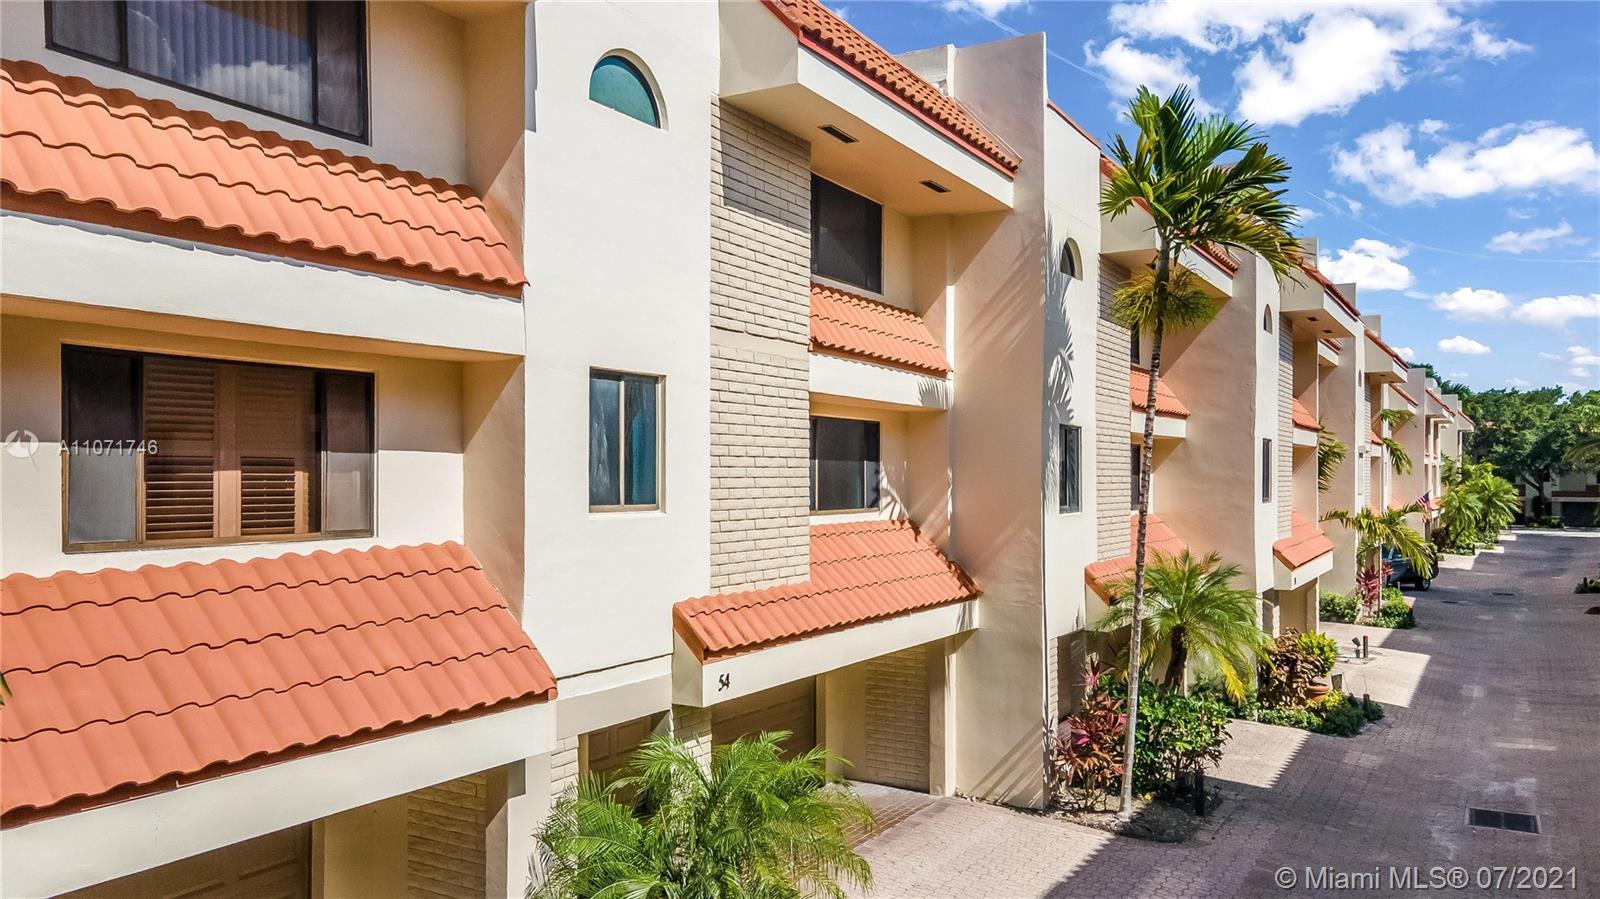 Victoria Park - 1401 NE 9th Street #54, Fort Lauderdale, FL 33304